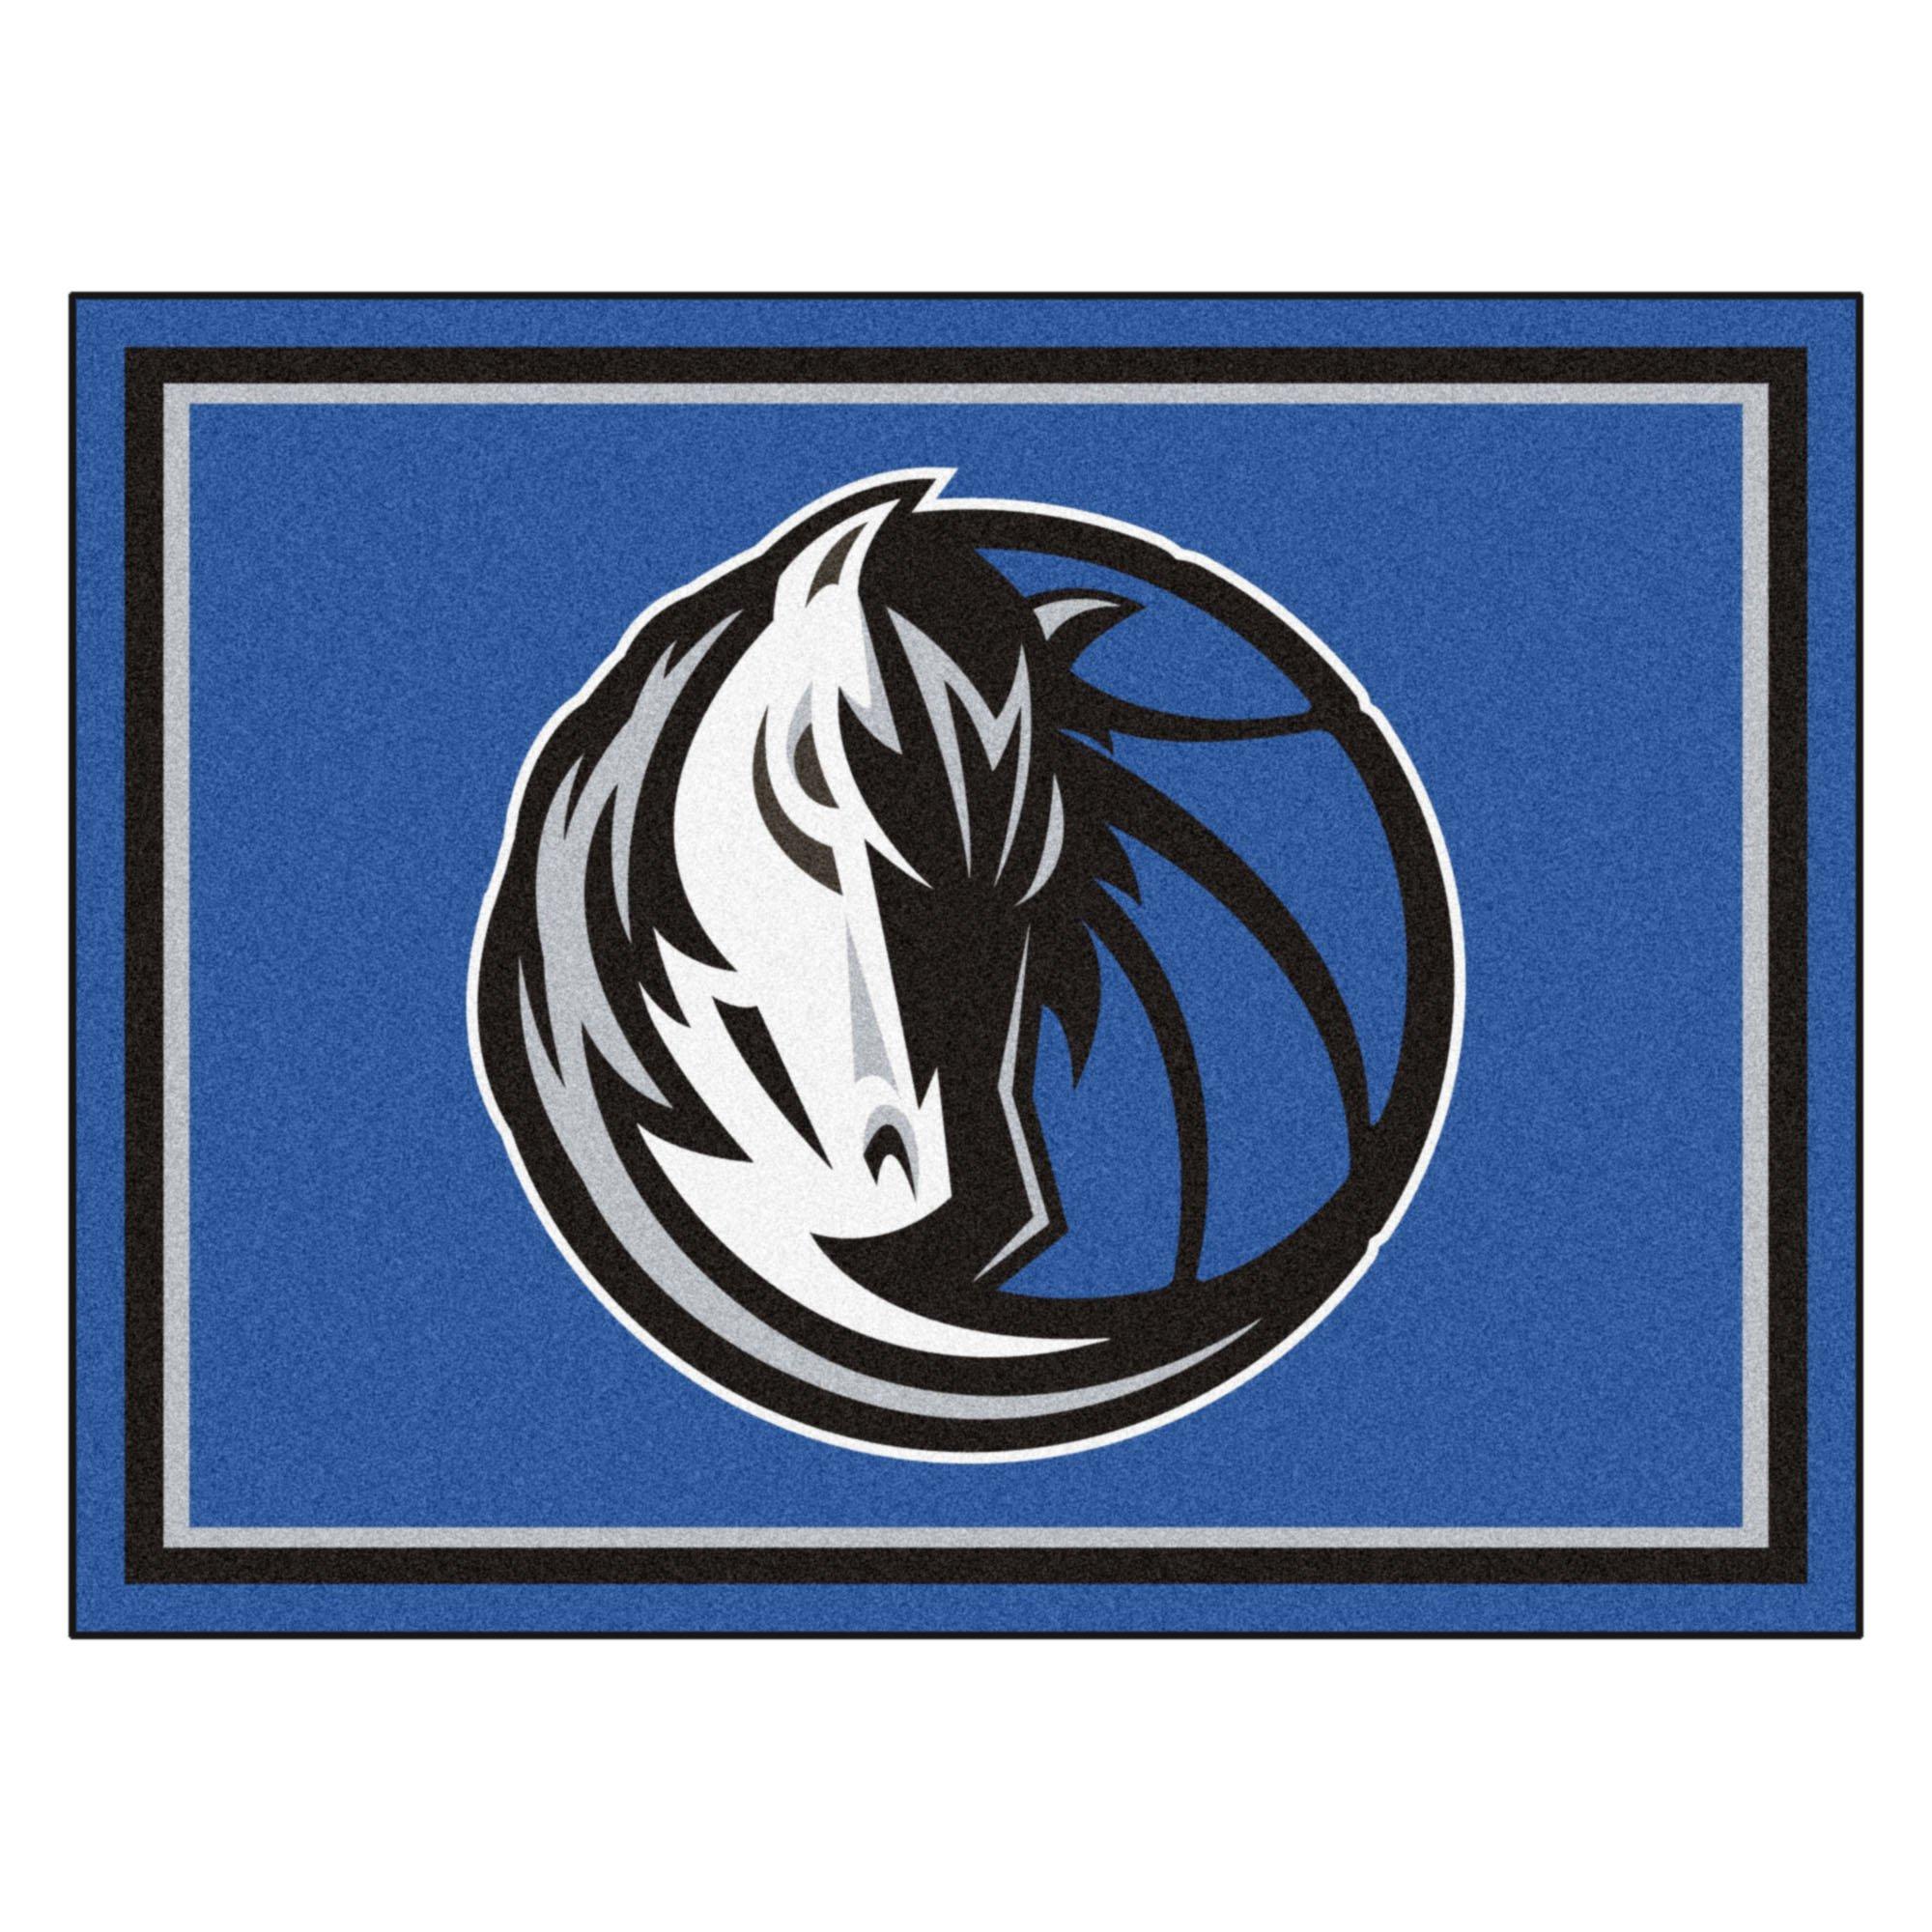 FANMATS 17448 NBA Dallas Mavericks Rug by Fanmats